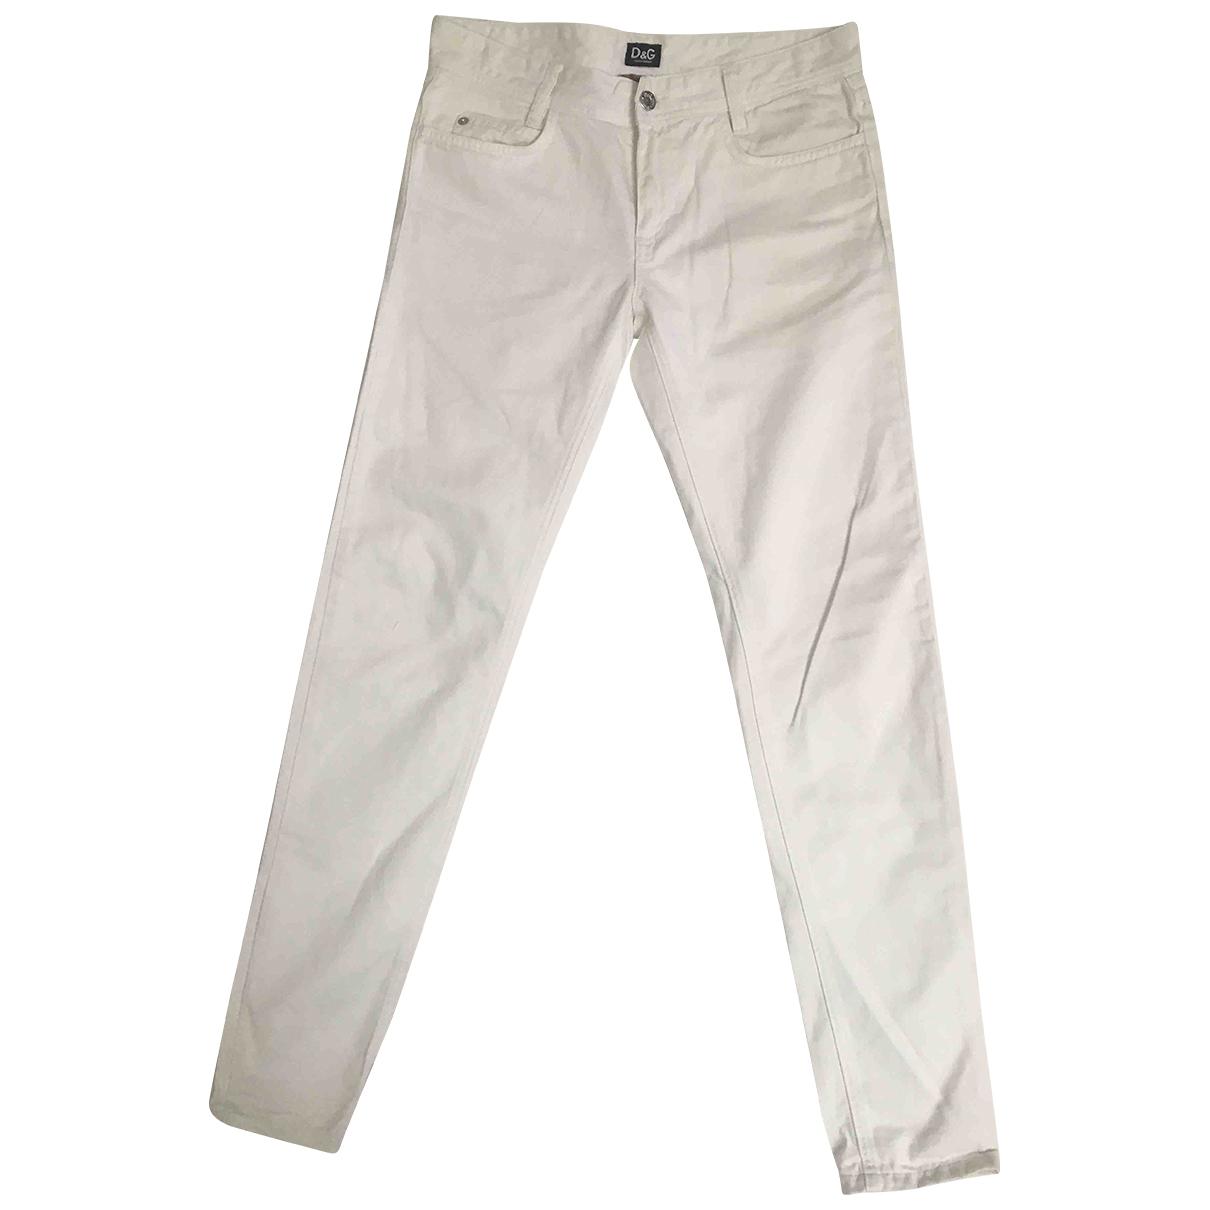 Pantalon en Algodon Blanco D&g